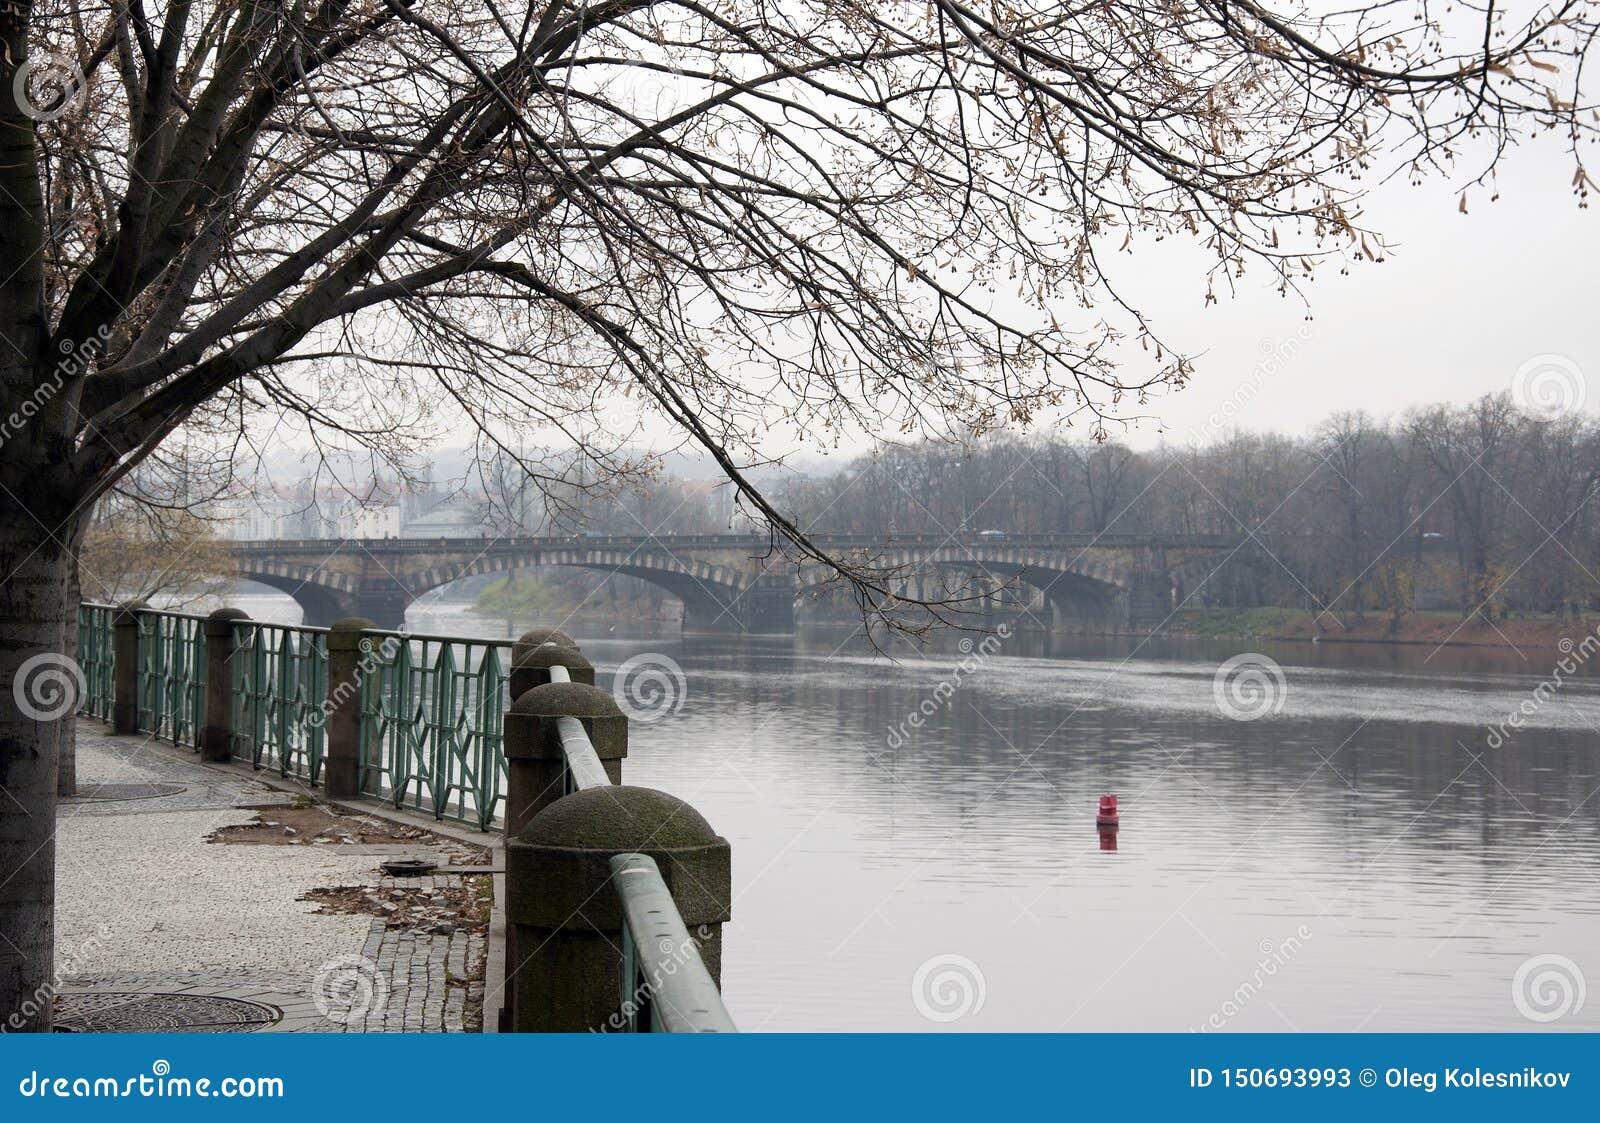 A bridge over the Vltava River in Prague in the fall